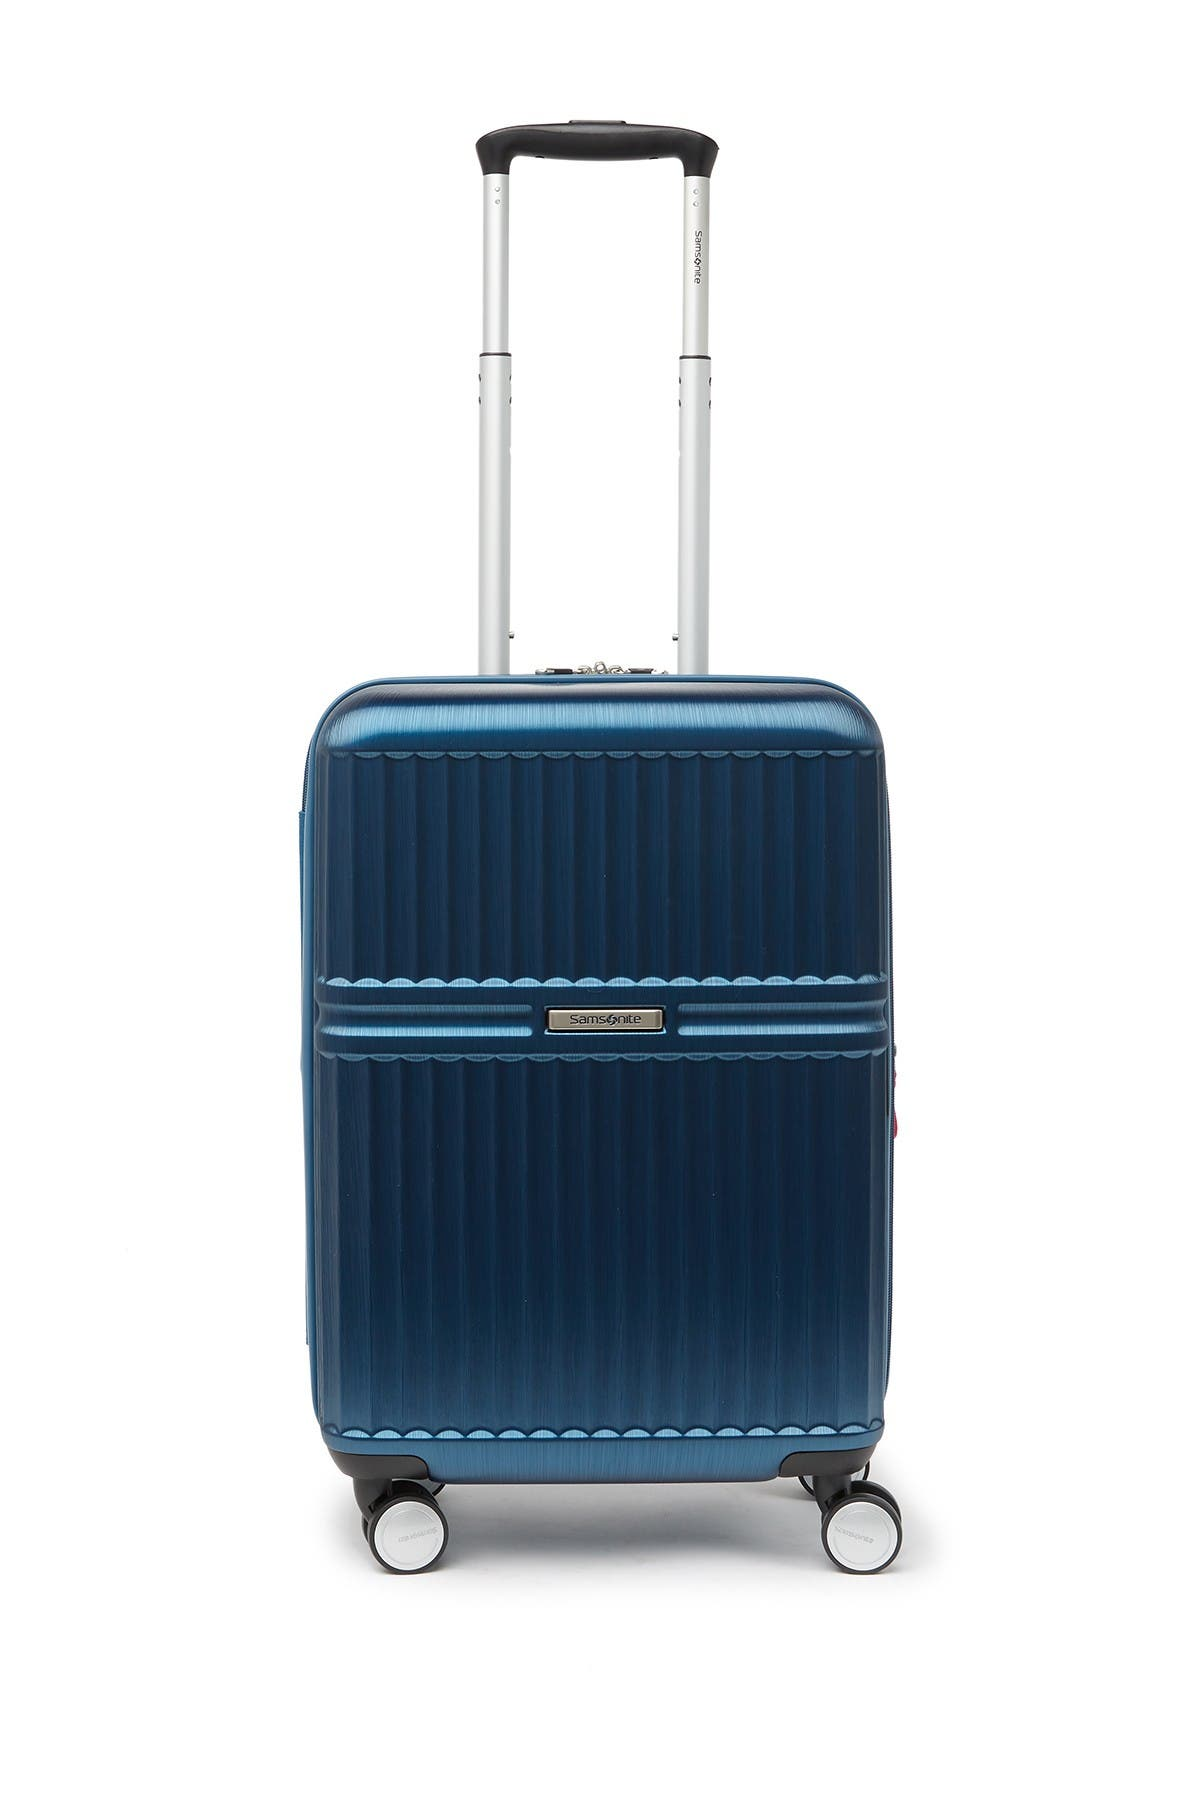 "Image of Samsonite 20"" Expandable Spinner Luggage"